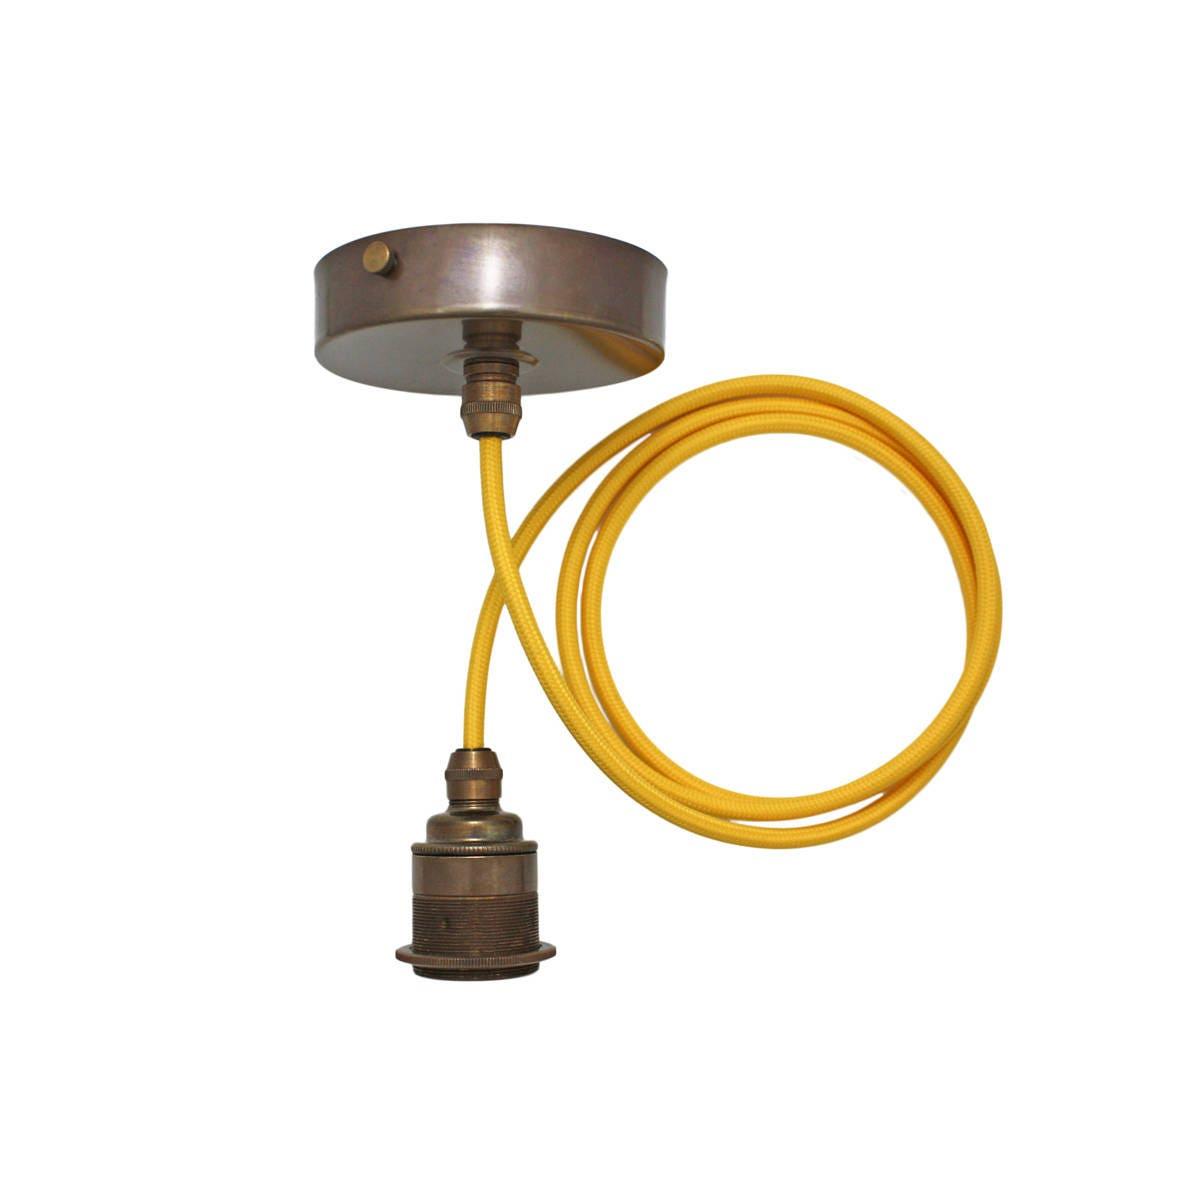 Brass Pendant Light Edison Screw Pendant Set Vintage Brass